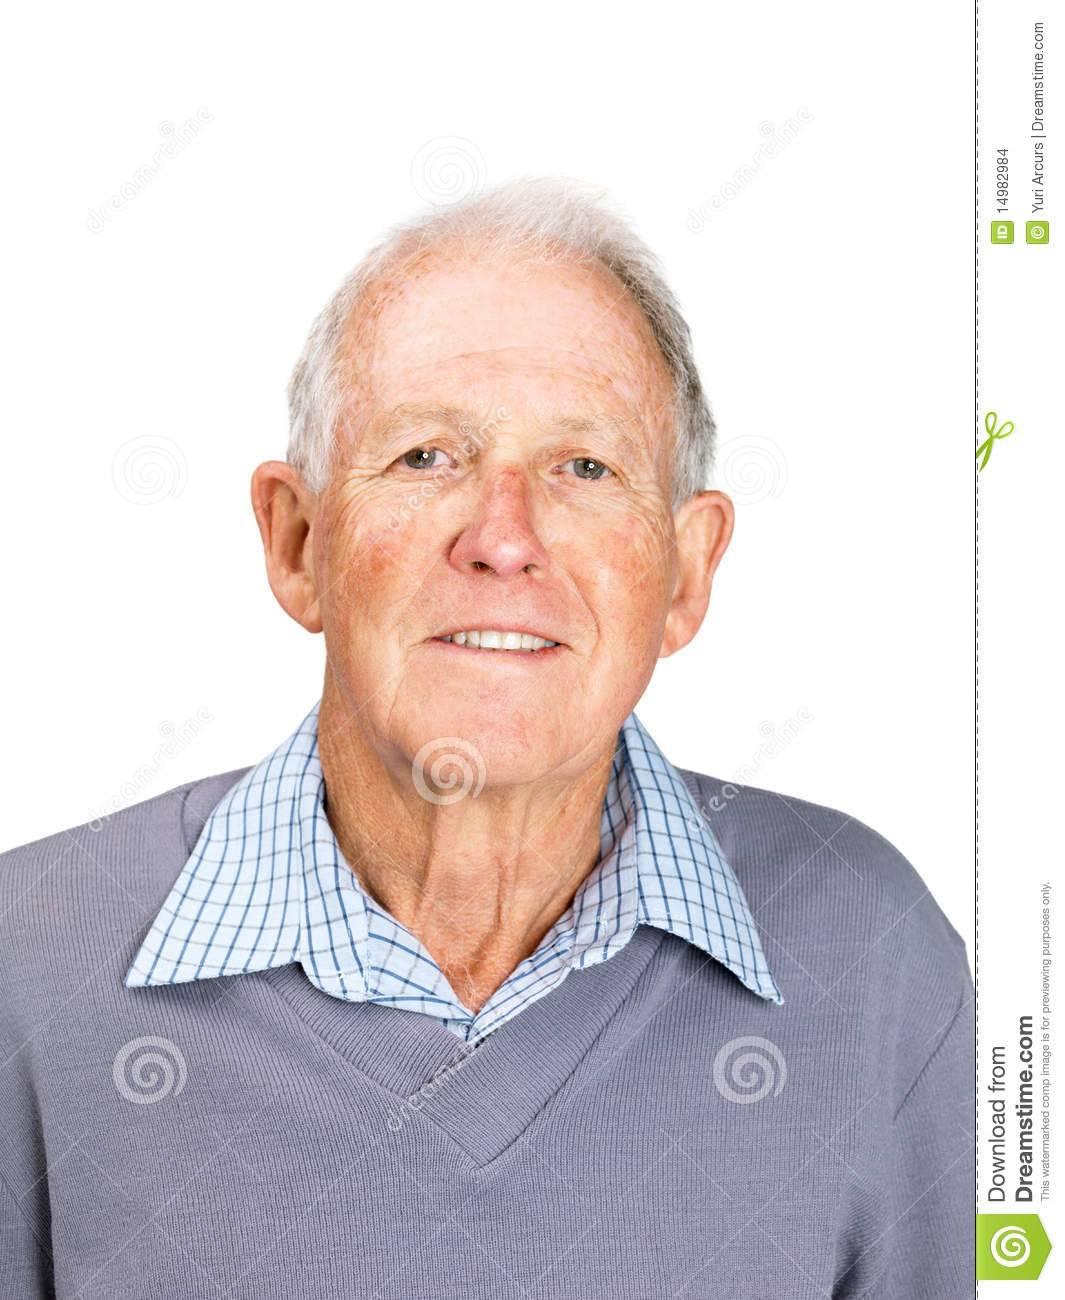 Life Insurance Quotes For Seniors: Affordable Health Insurance For Seniors